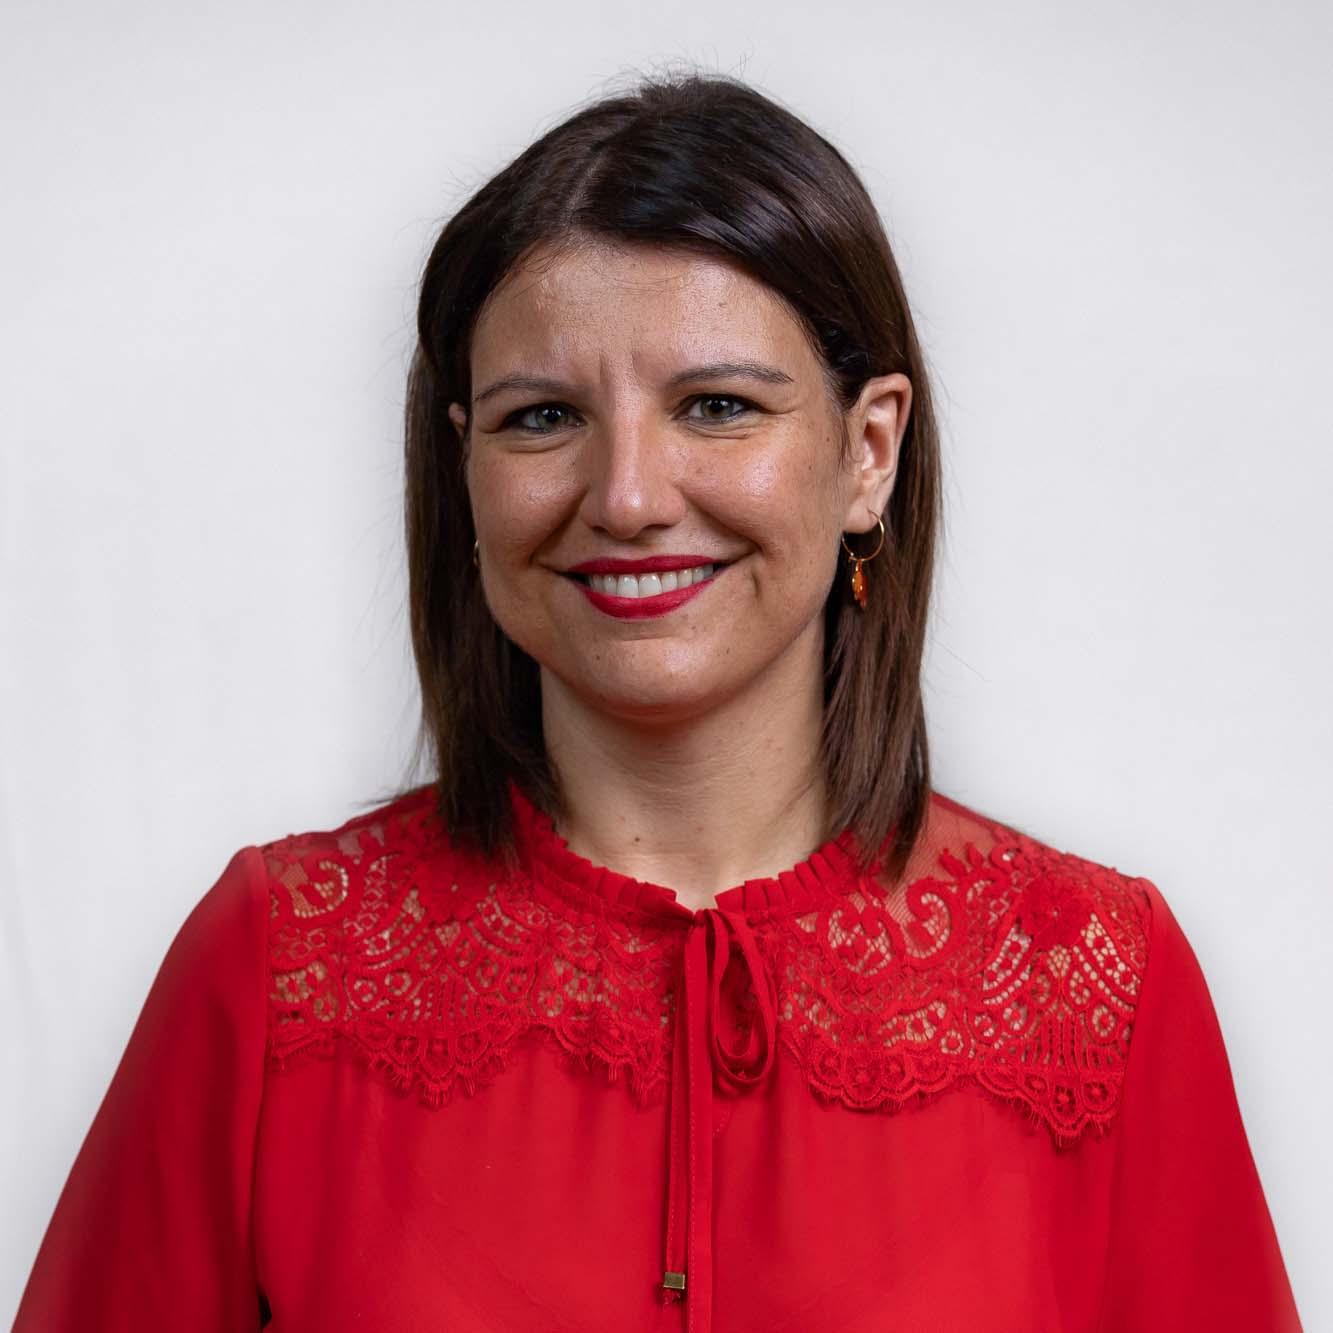 Dott.ssa Giovanna Blanco